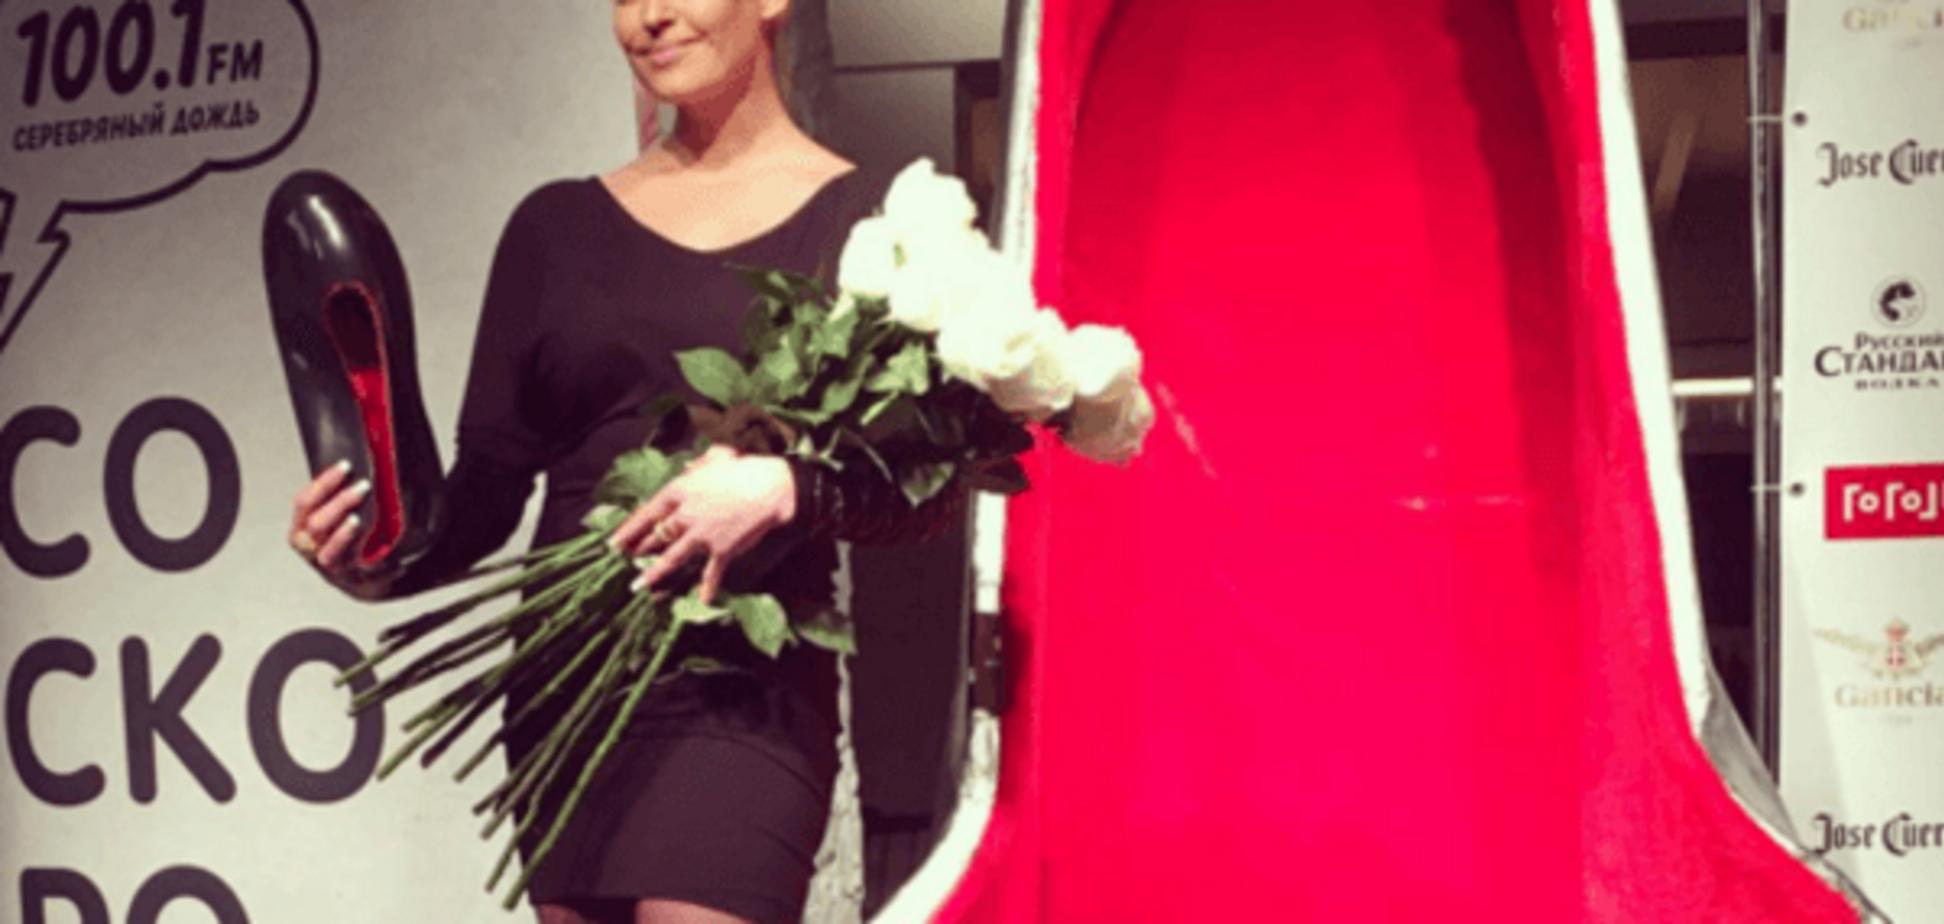 'Королева Инстаграма': Волочкова получила анти-награду за свои коронные шпагаты